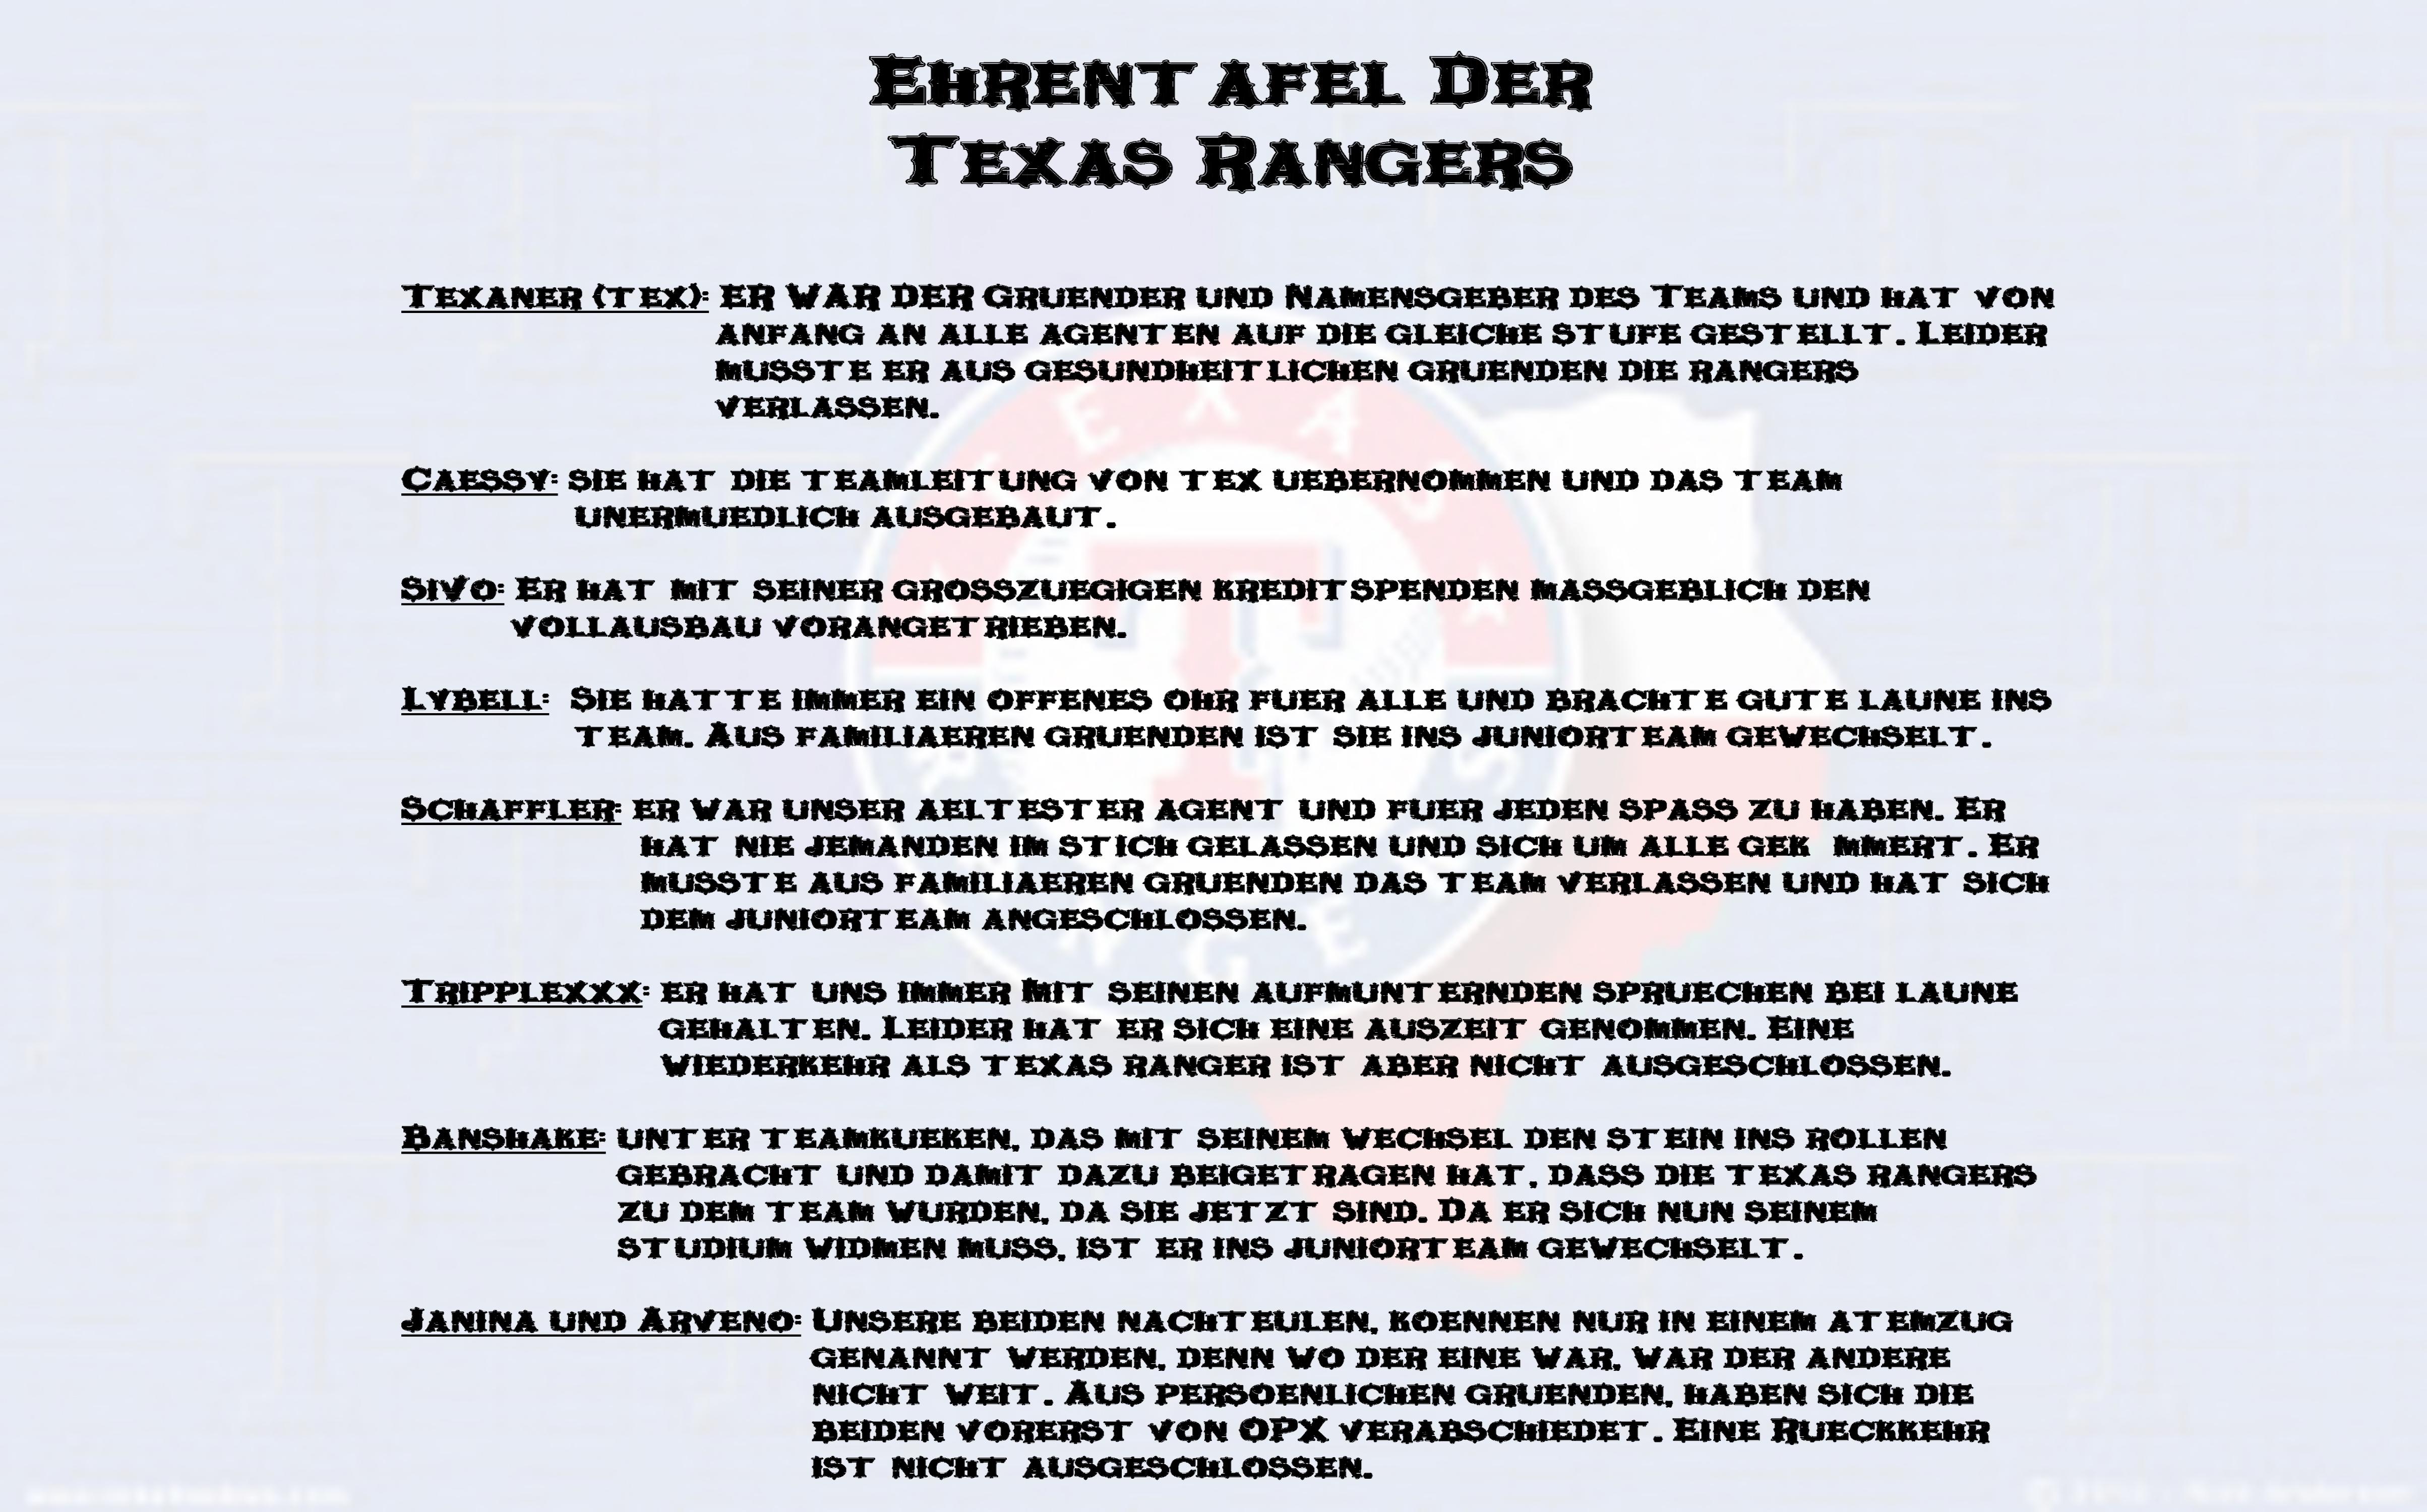 ehrentafel_trd6d3d.jpg